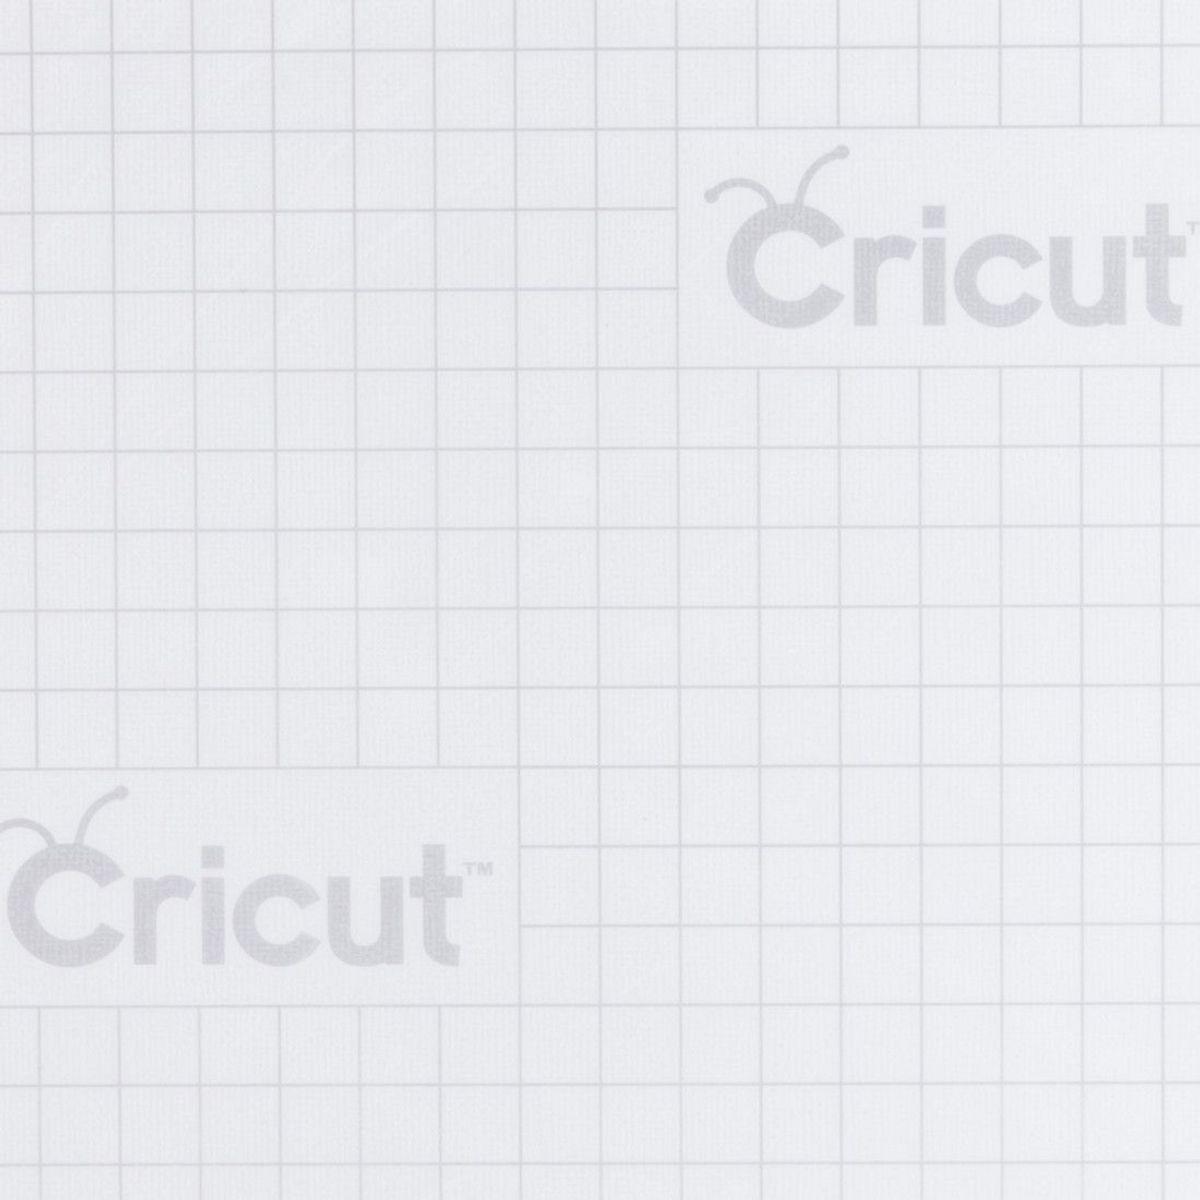 Bande de transfert 30,5 cm x 366 cm Cricut